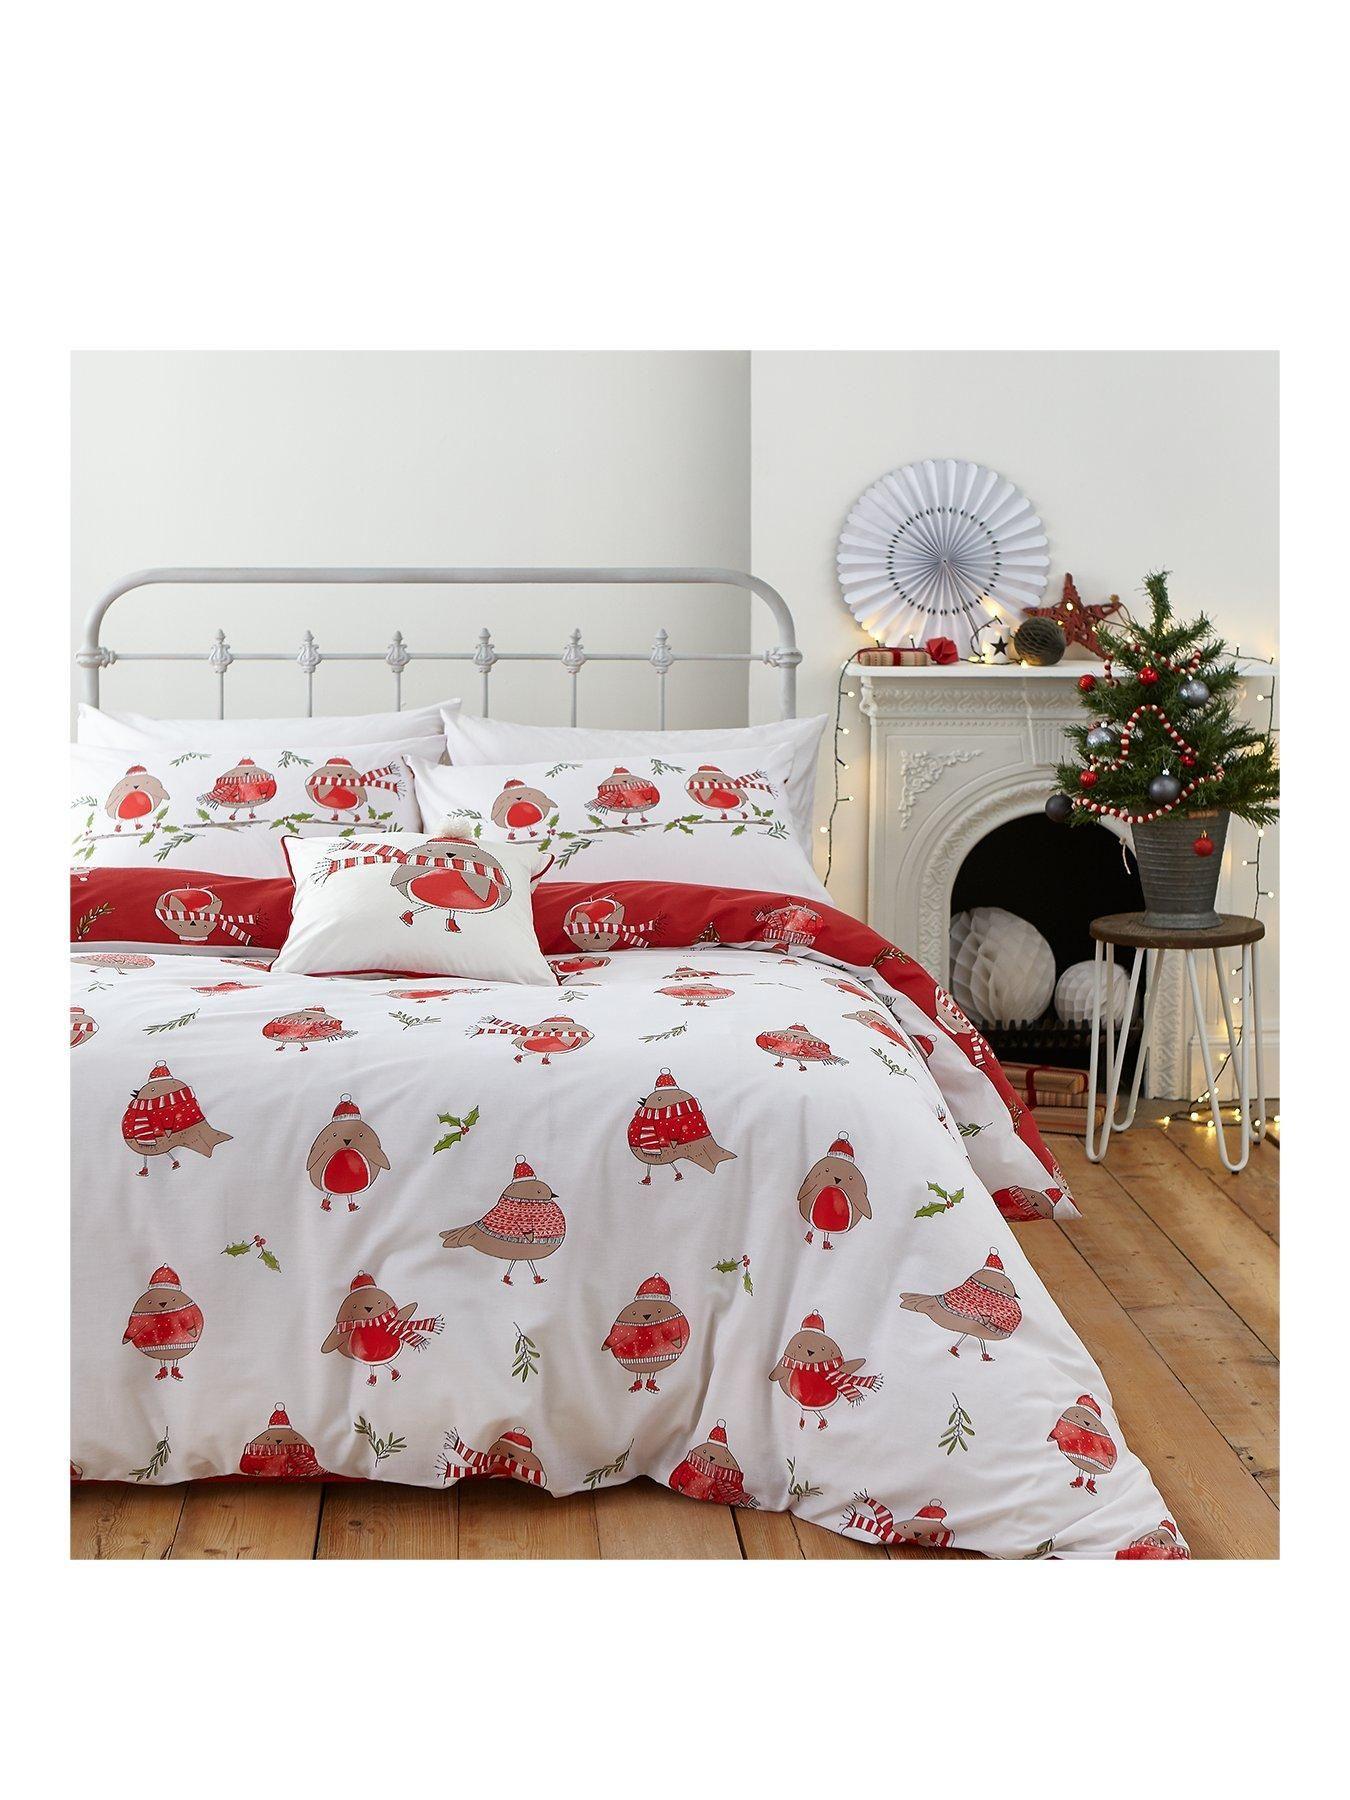 26 Christmas Bedding Sets Best Christmas Duvet Covers